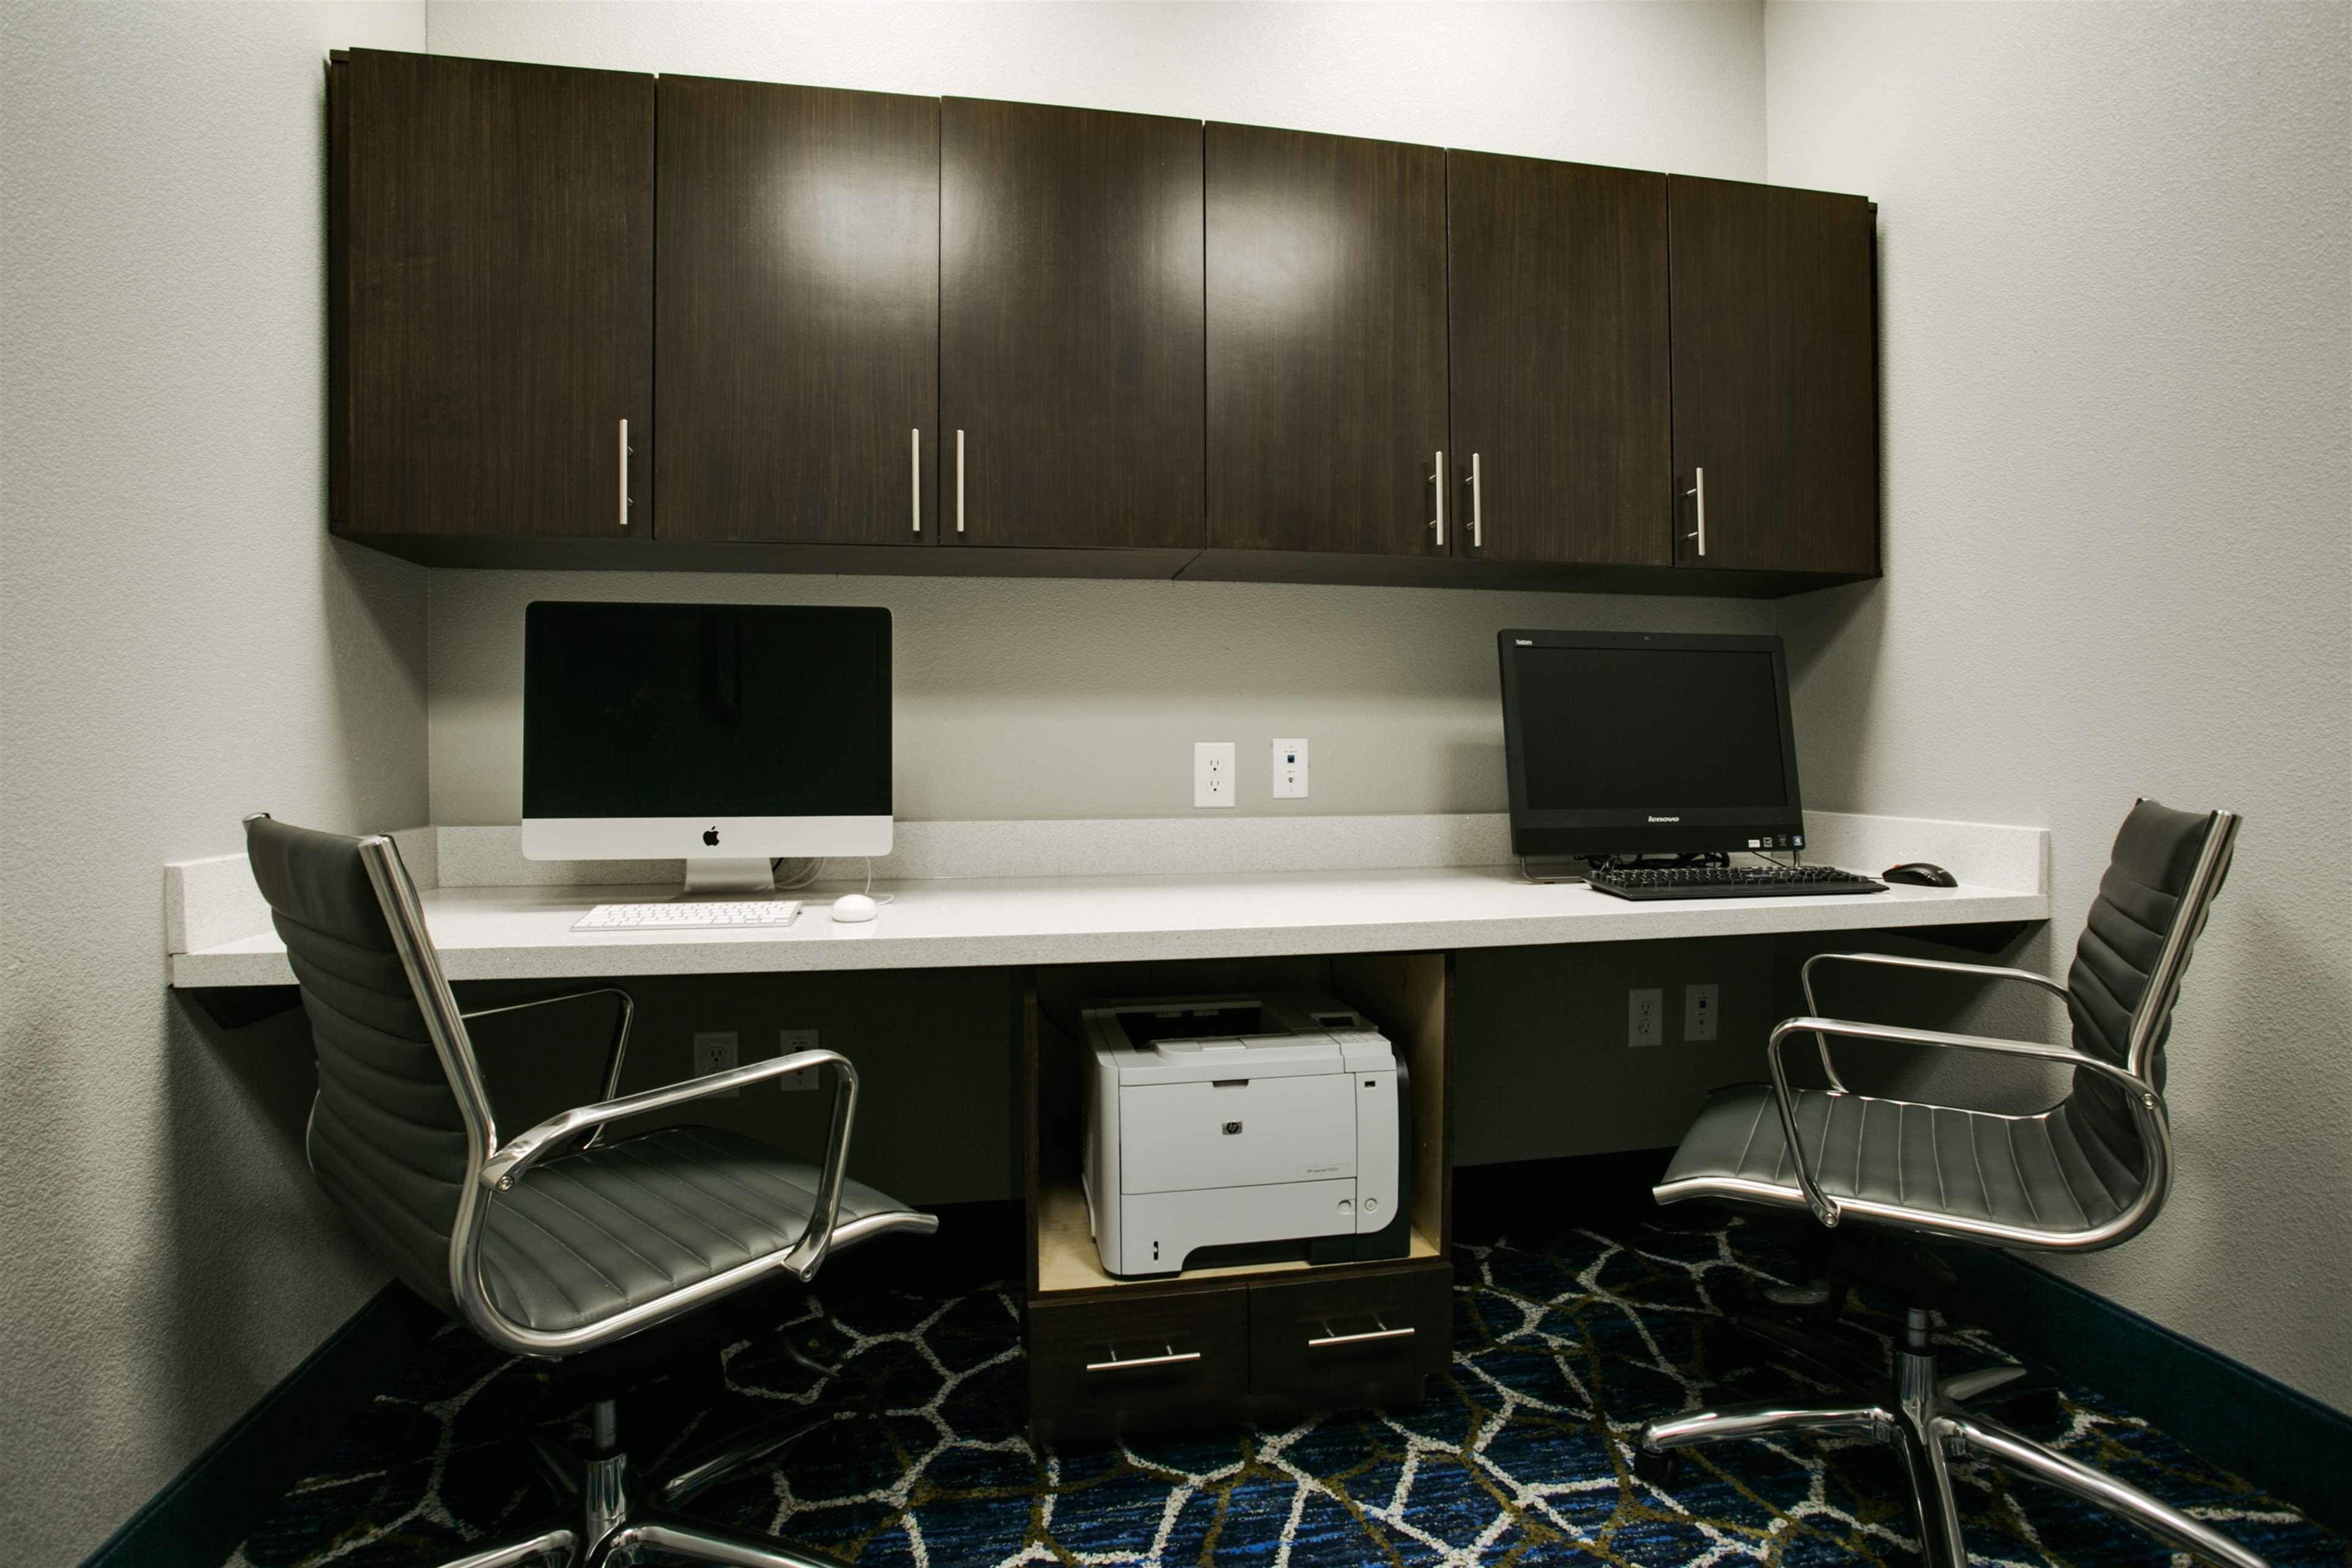 Hampton Inn & Suites Dallas/Ft. Worth Airport South image 39